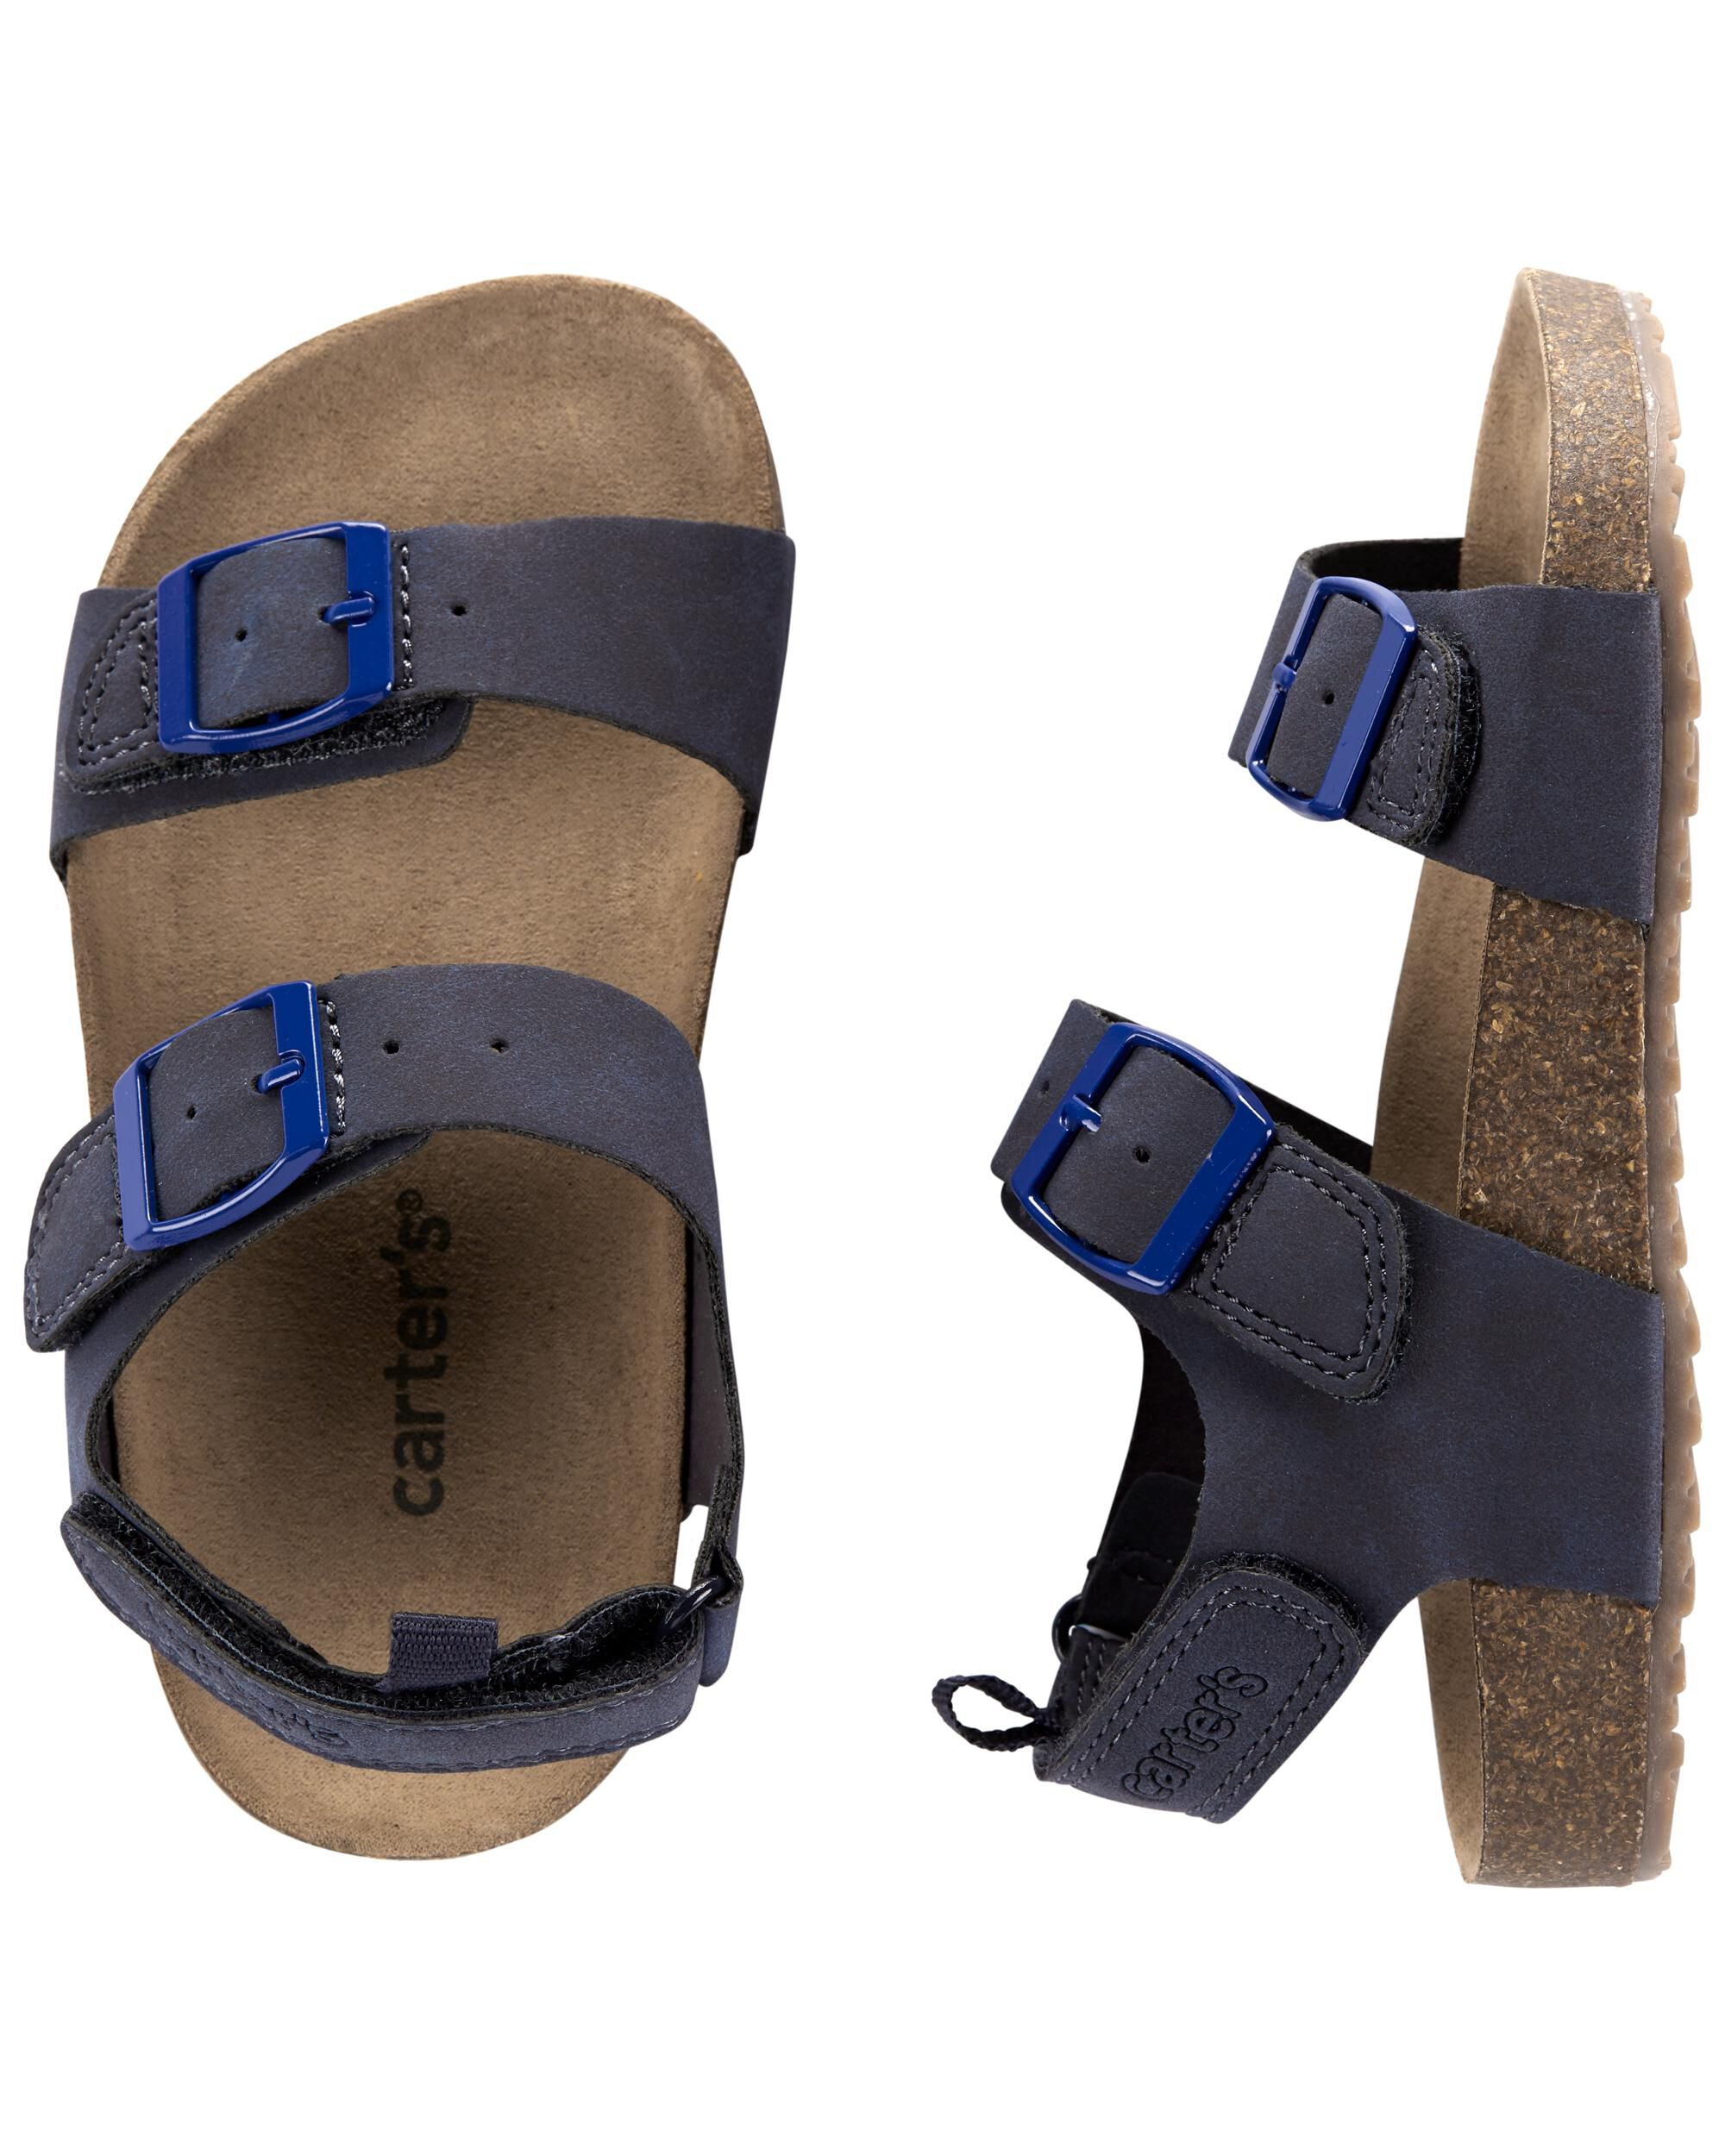 Carters Cork Sandals